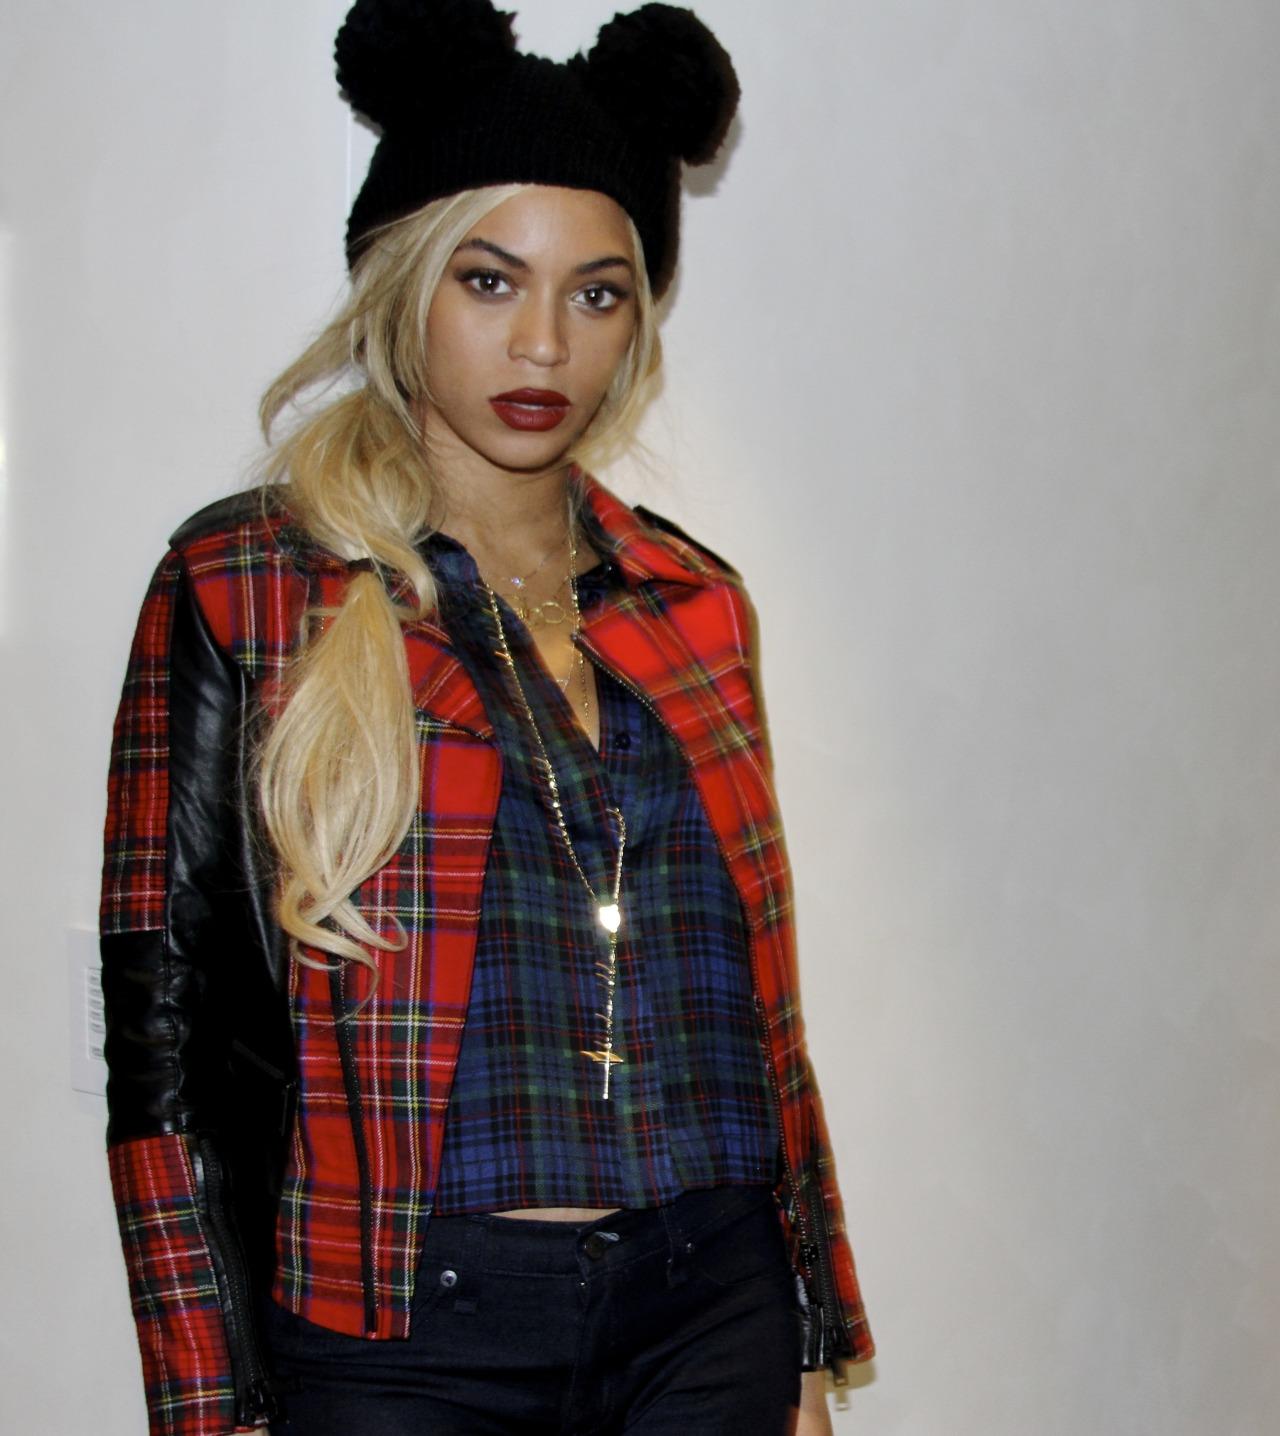 Beyoncé - Twitter (@Beyonce), Instagram (Baddiebey), Tumblr (I Am...) [II] - Página 2 Tumblr_n0i390HvAT1rqgjz2o1_1280